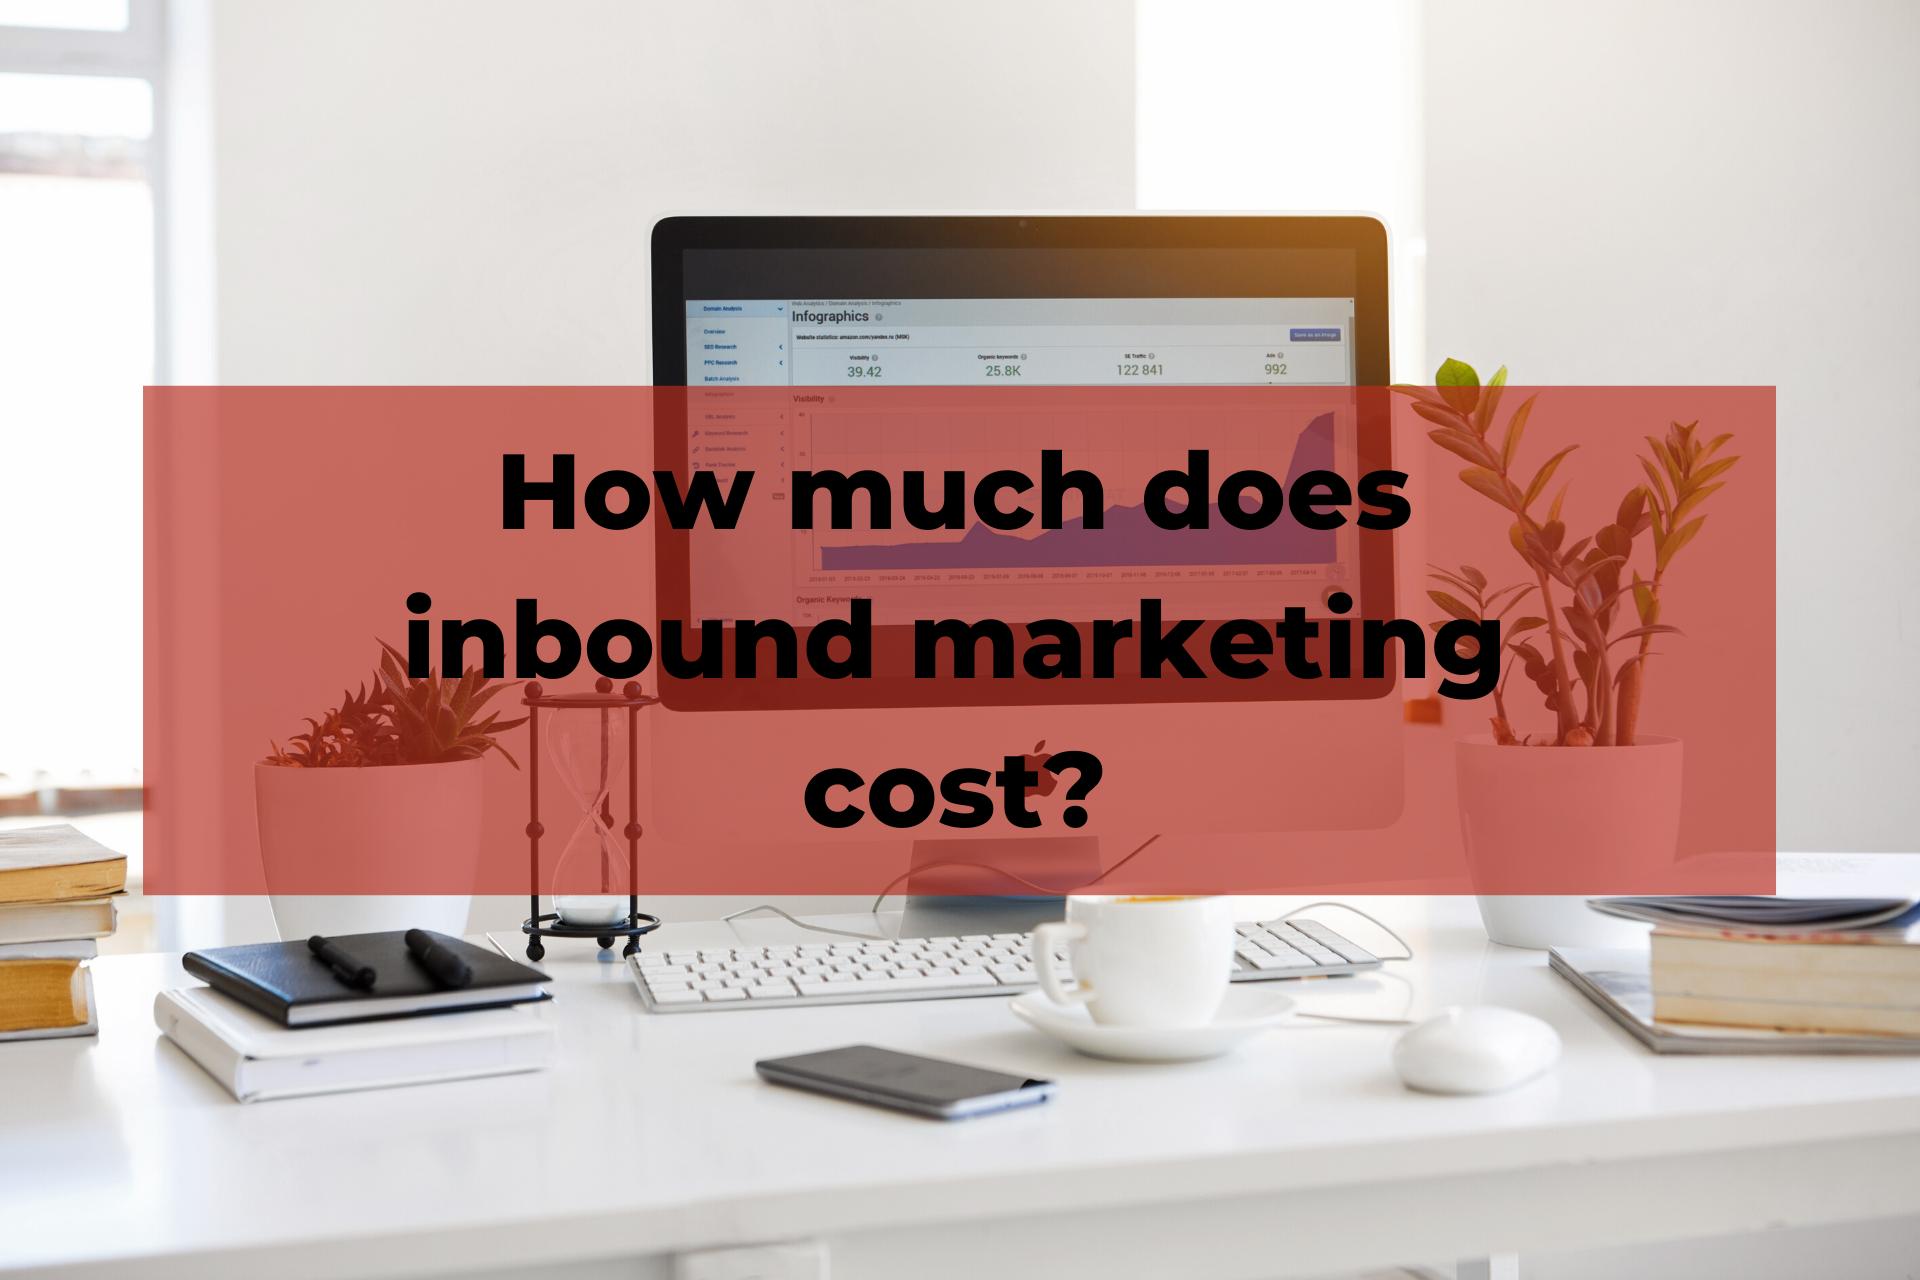 How much does inbound marketing cost?